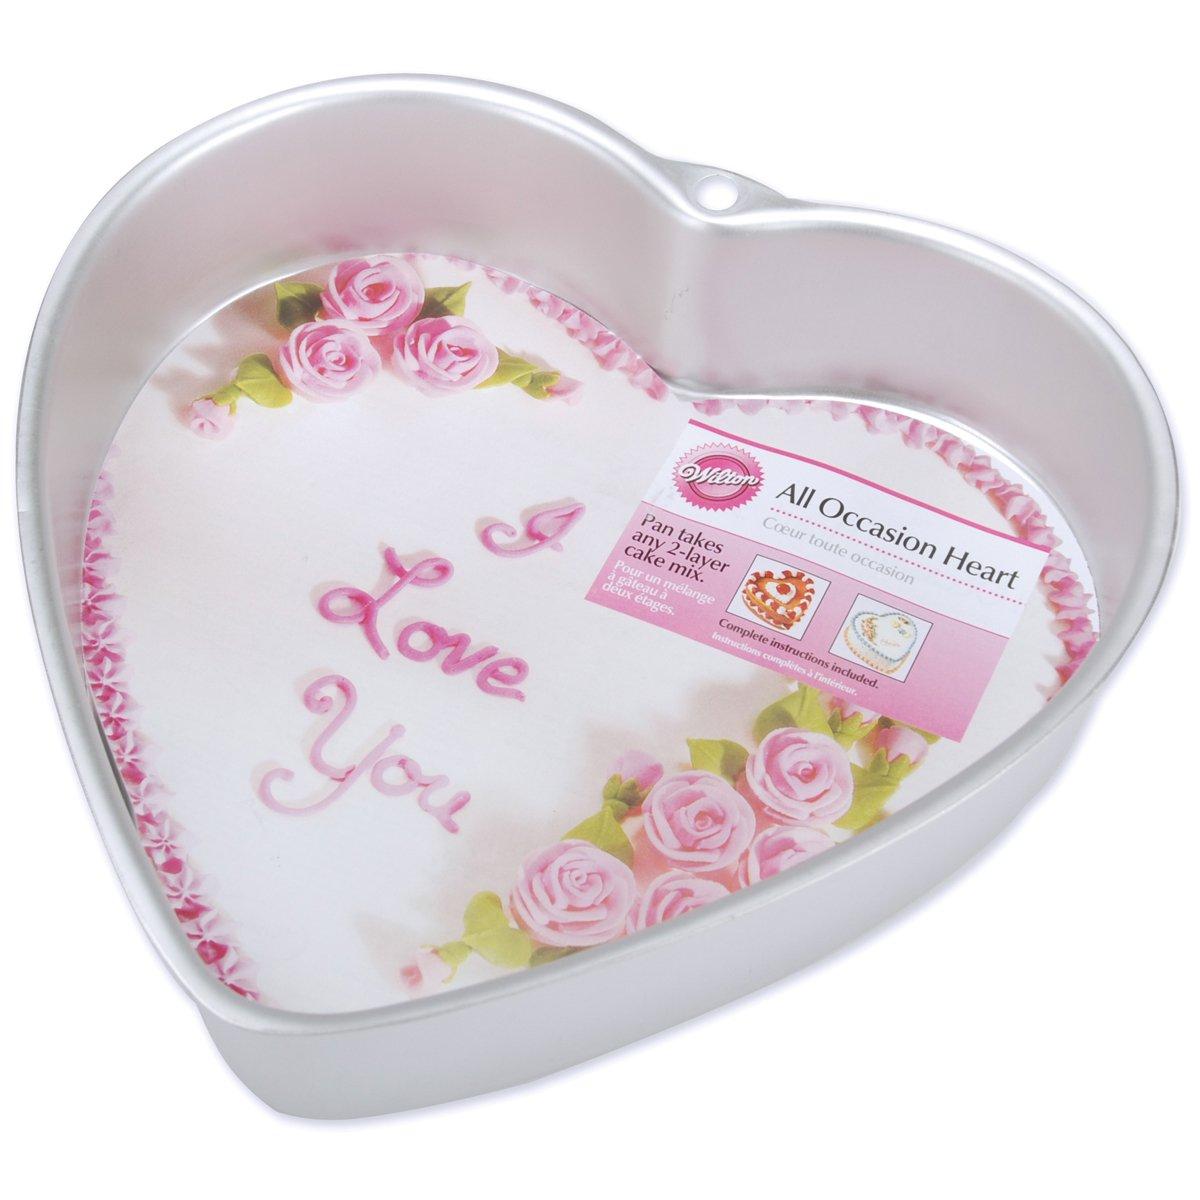 Wilton 9 Inch Heart Pan (2105-5176)